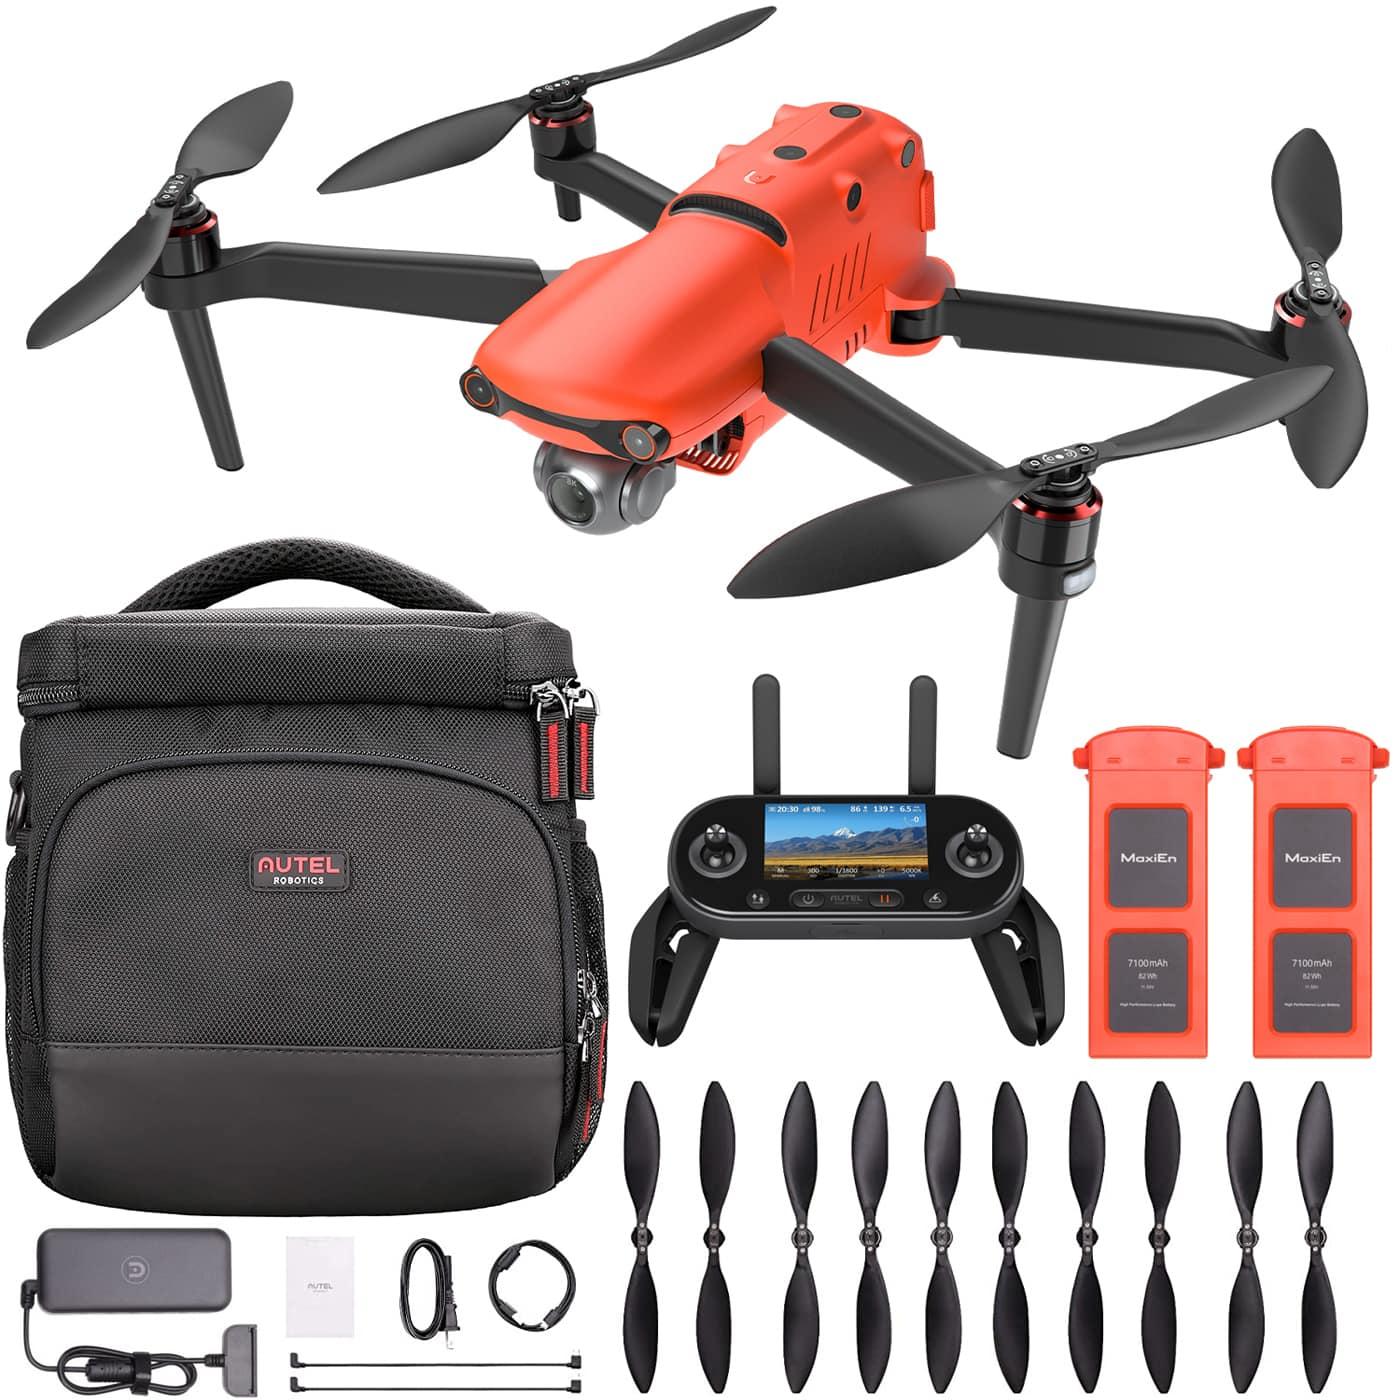 Autel Robotics EVO II Folding Drone Quadcopter 8K HDR Aircraft + On The Go Bundle